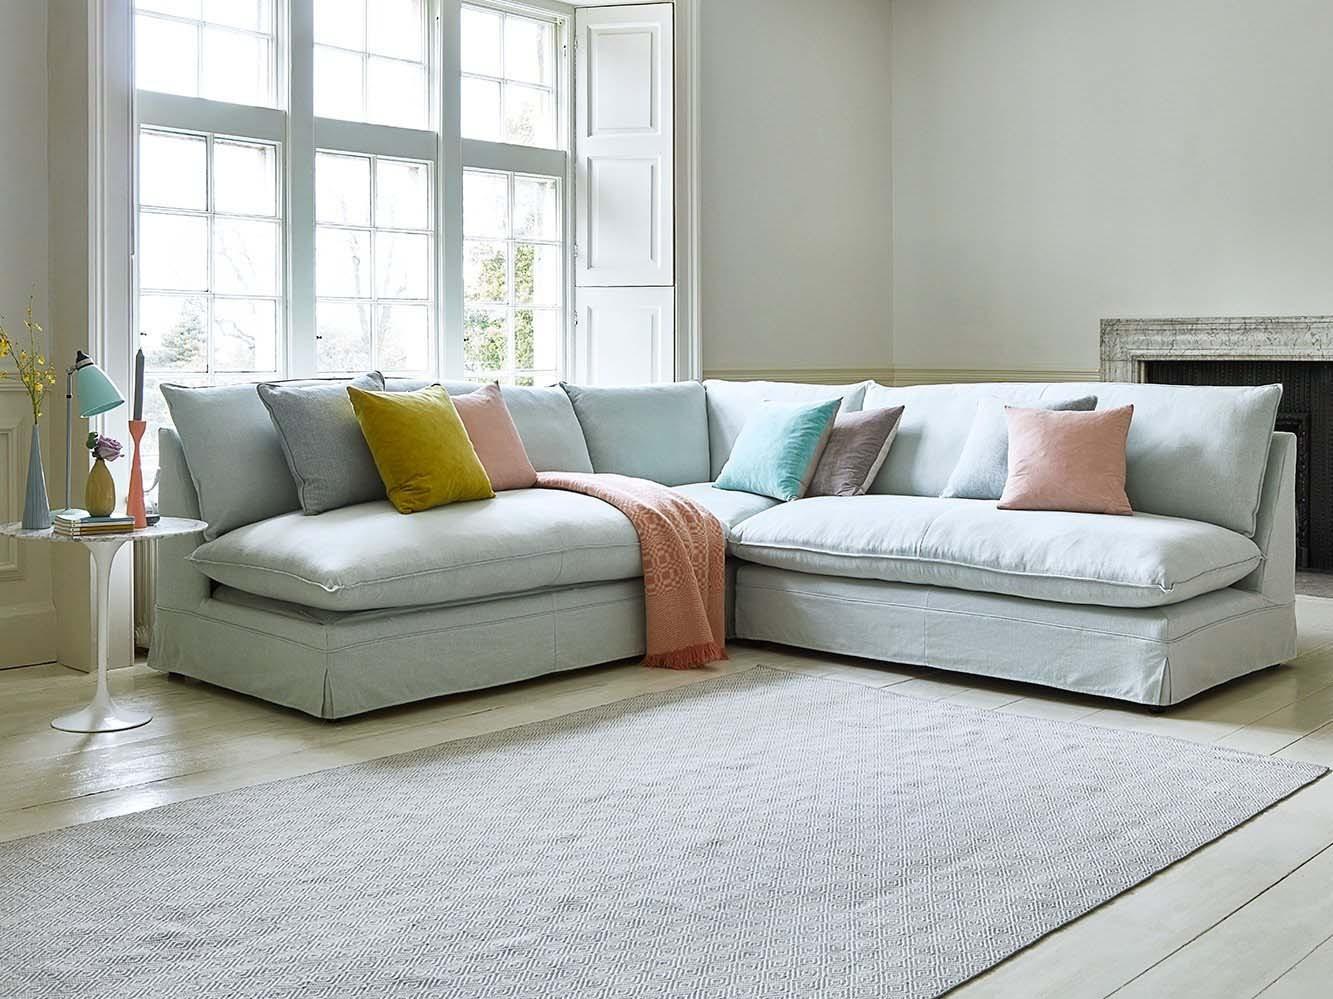 The Deverill Modular Corner Sofa